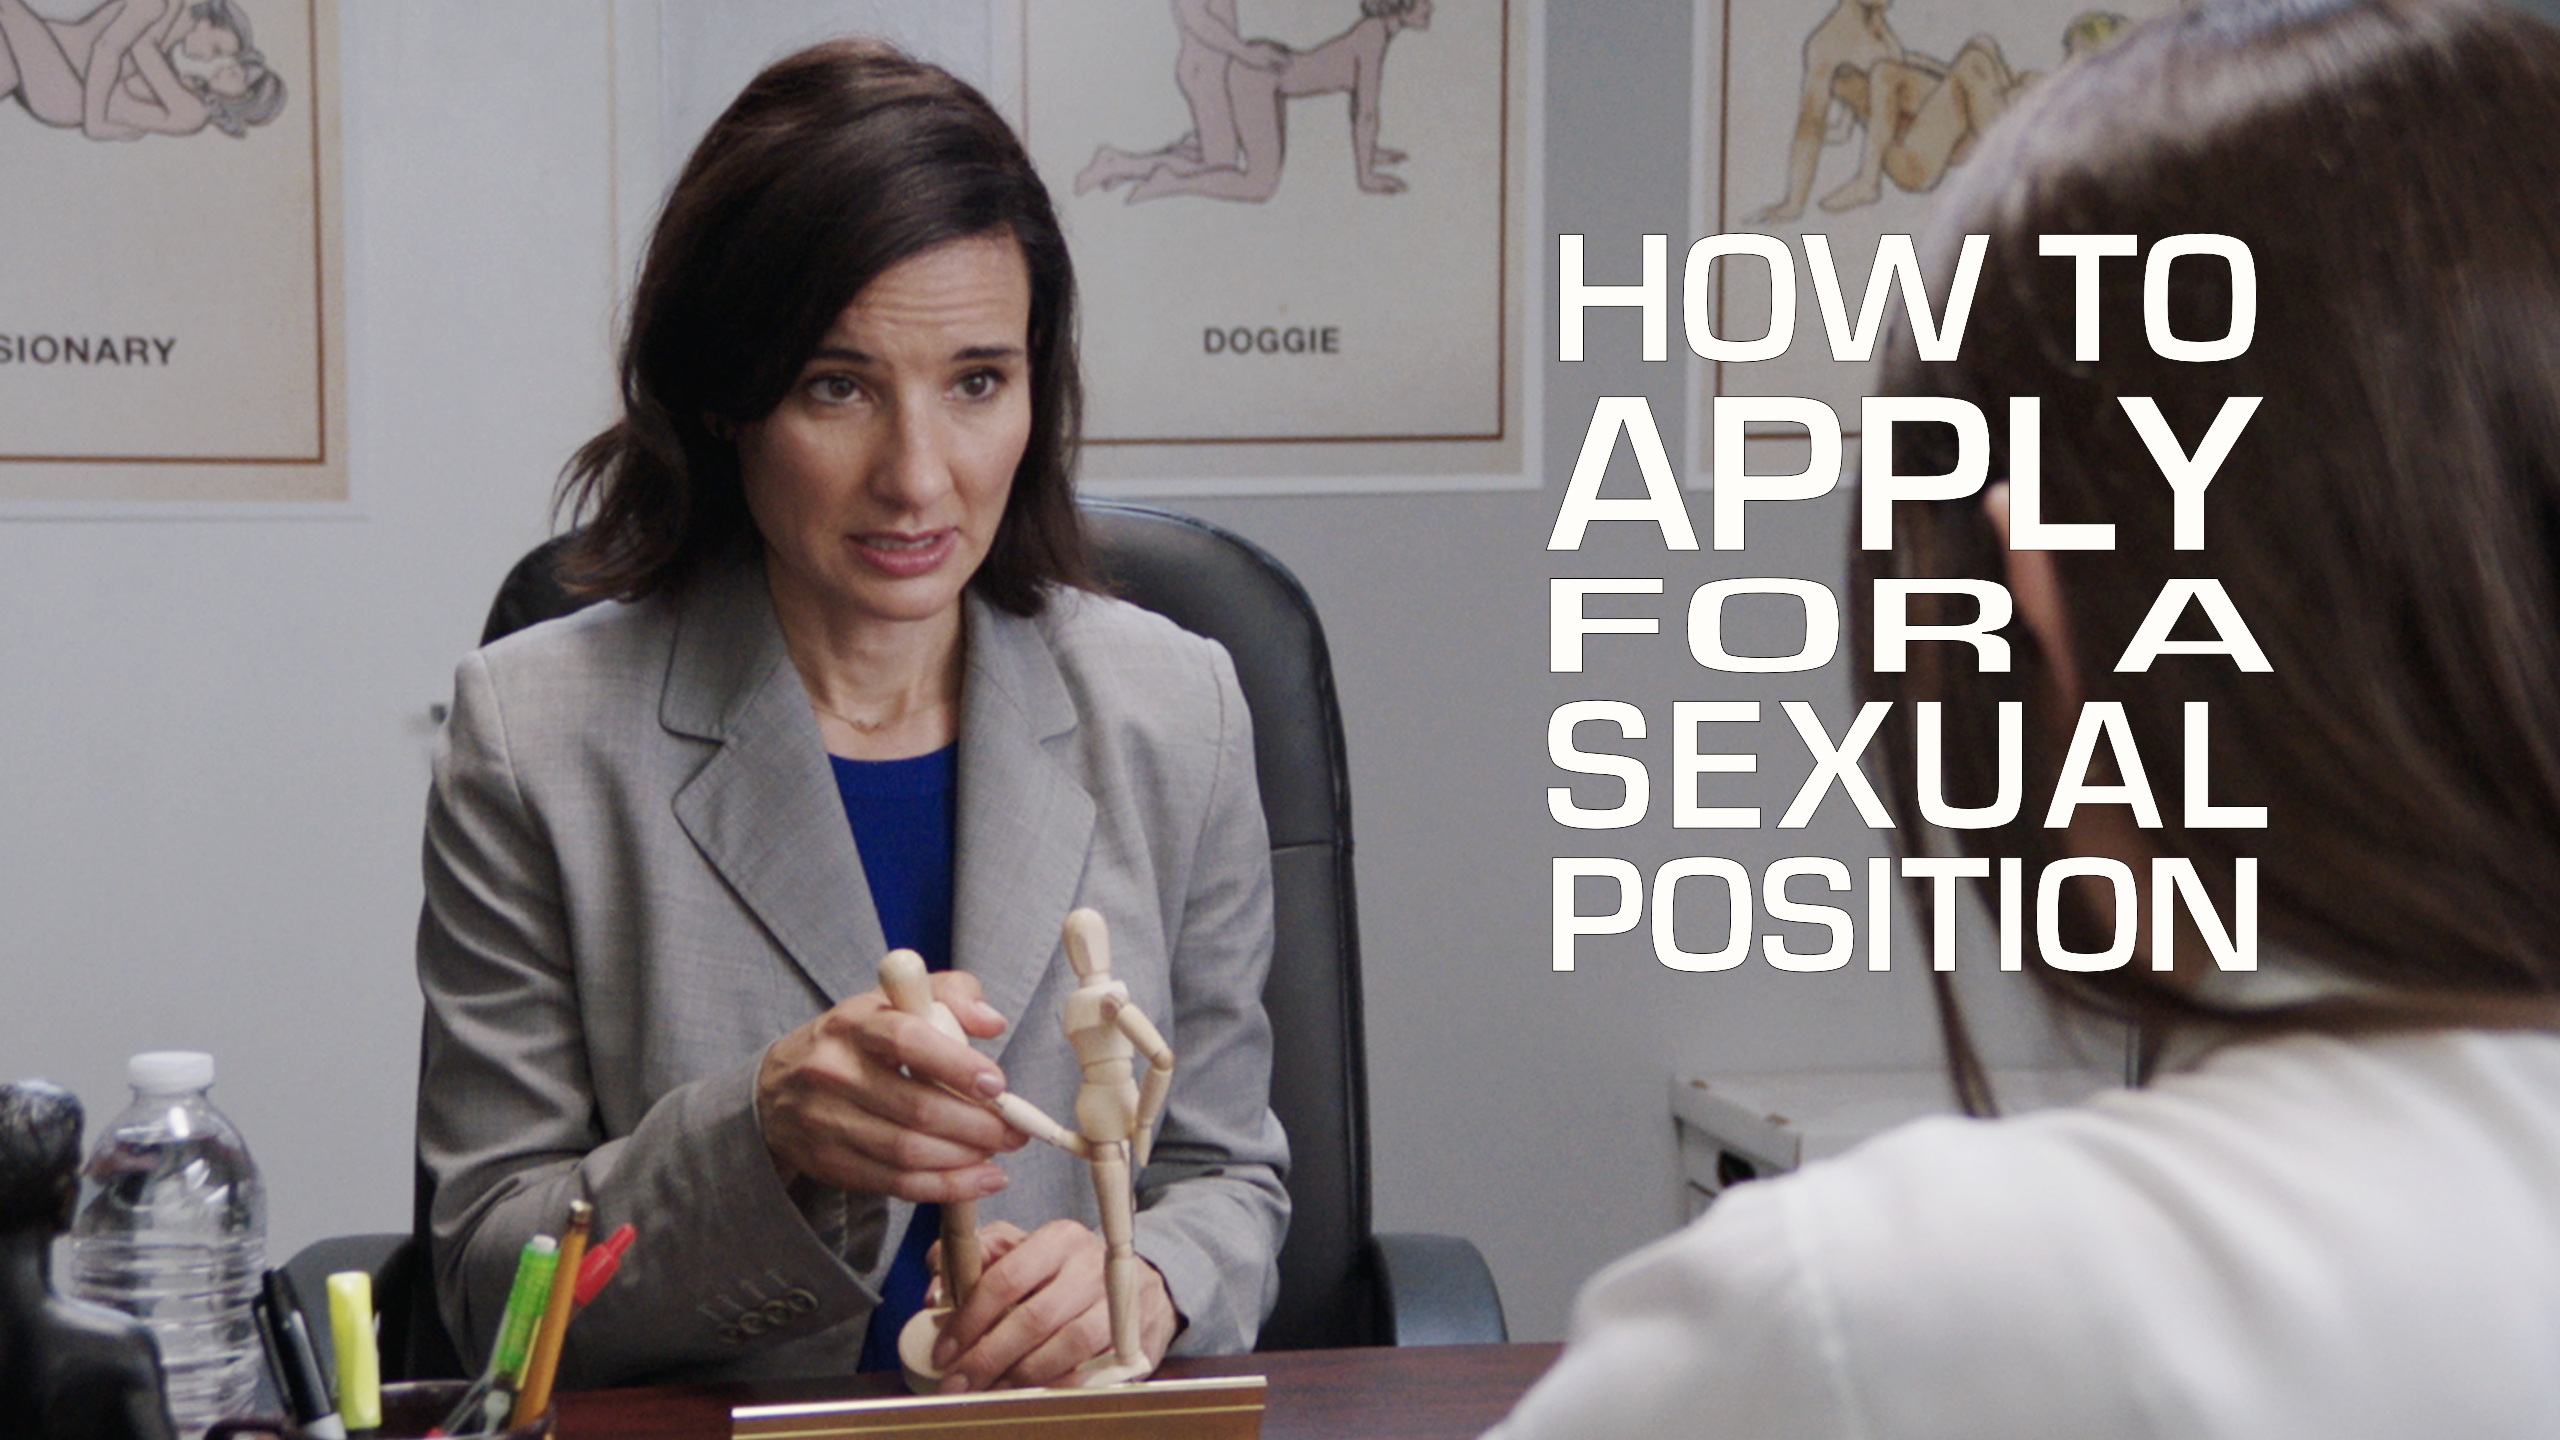 Rusty nail sex position videos